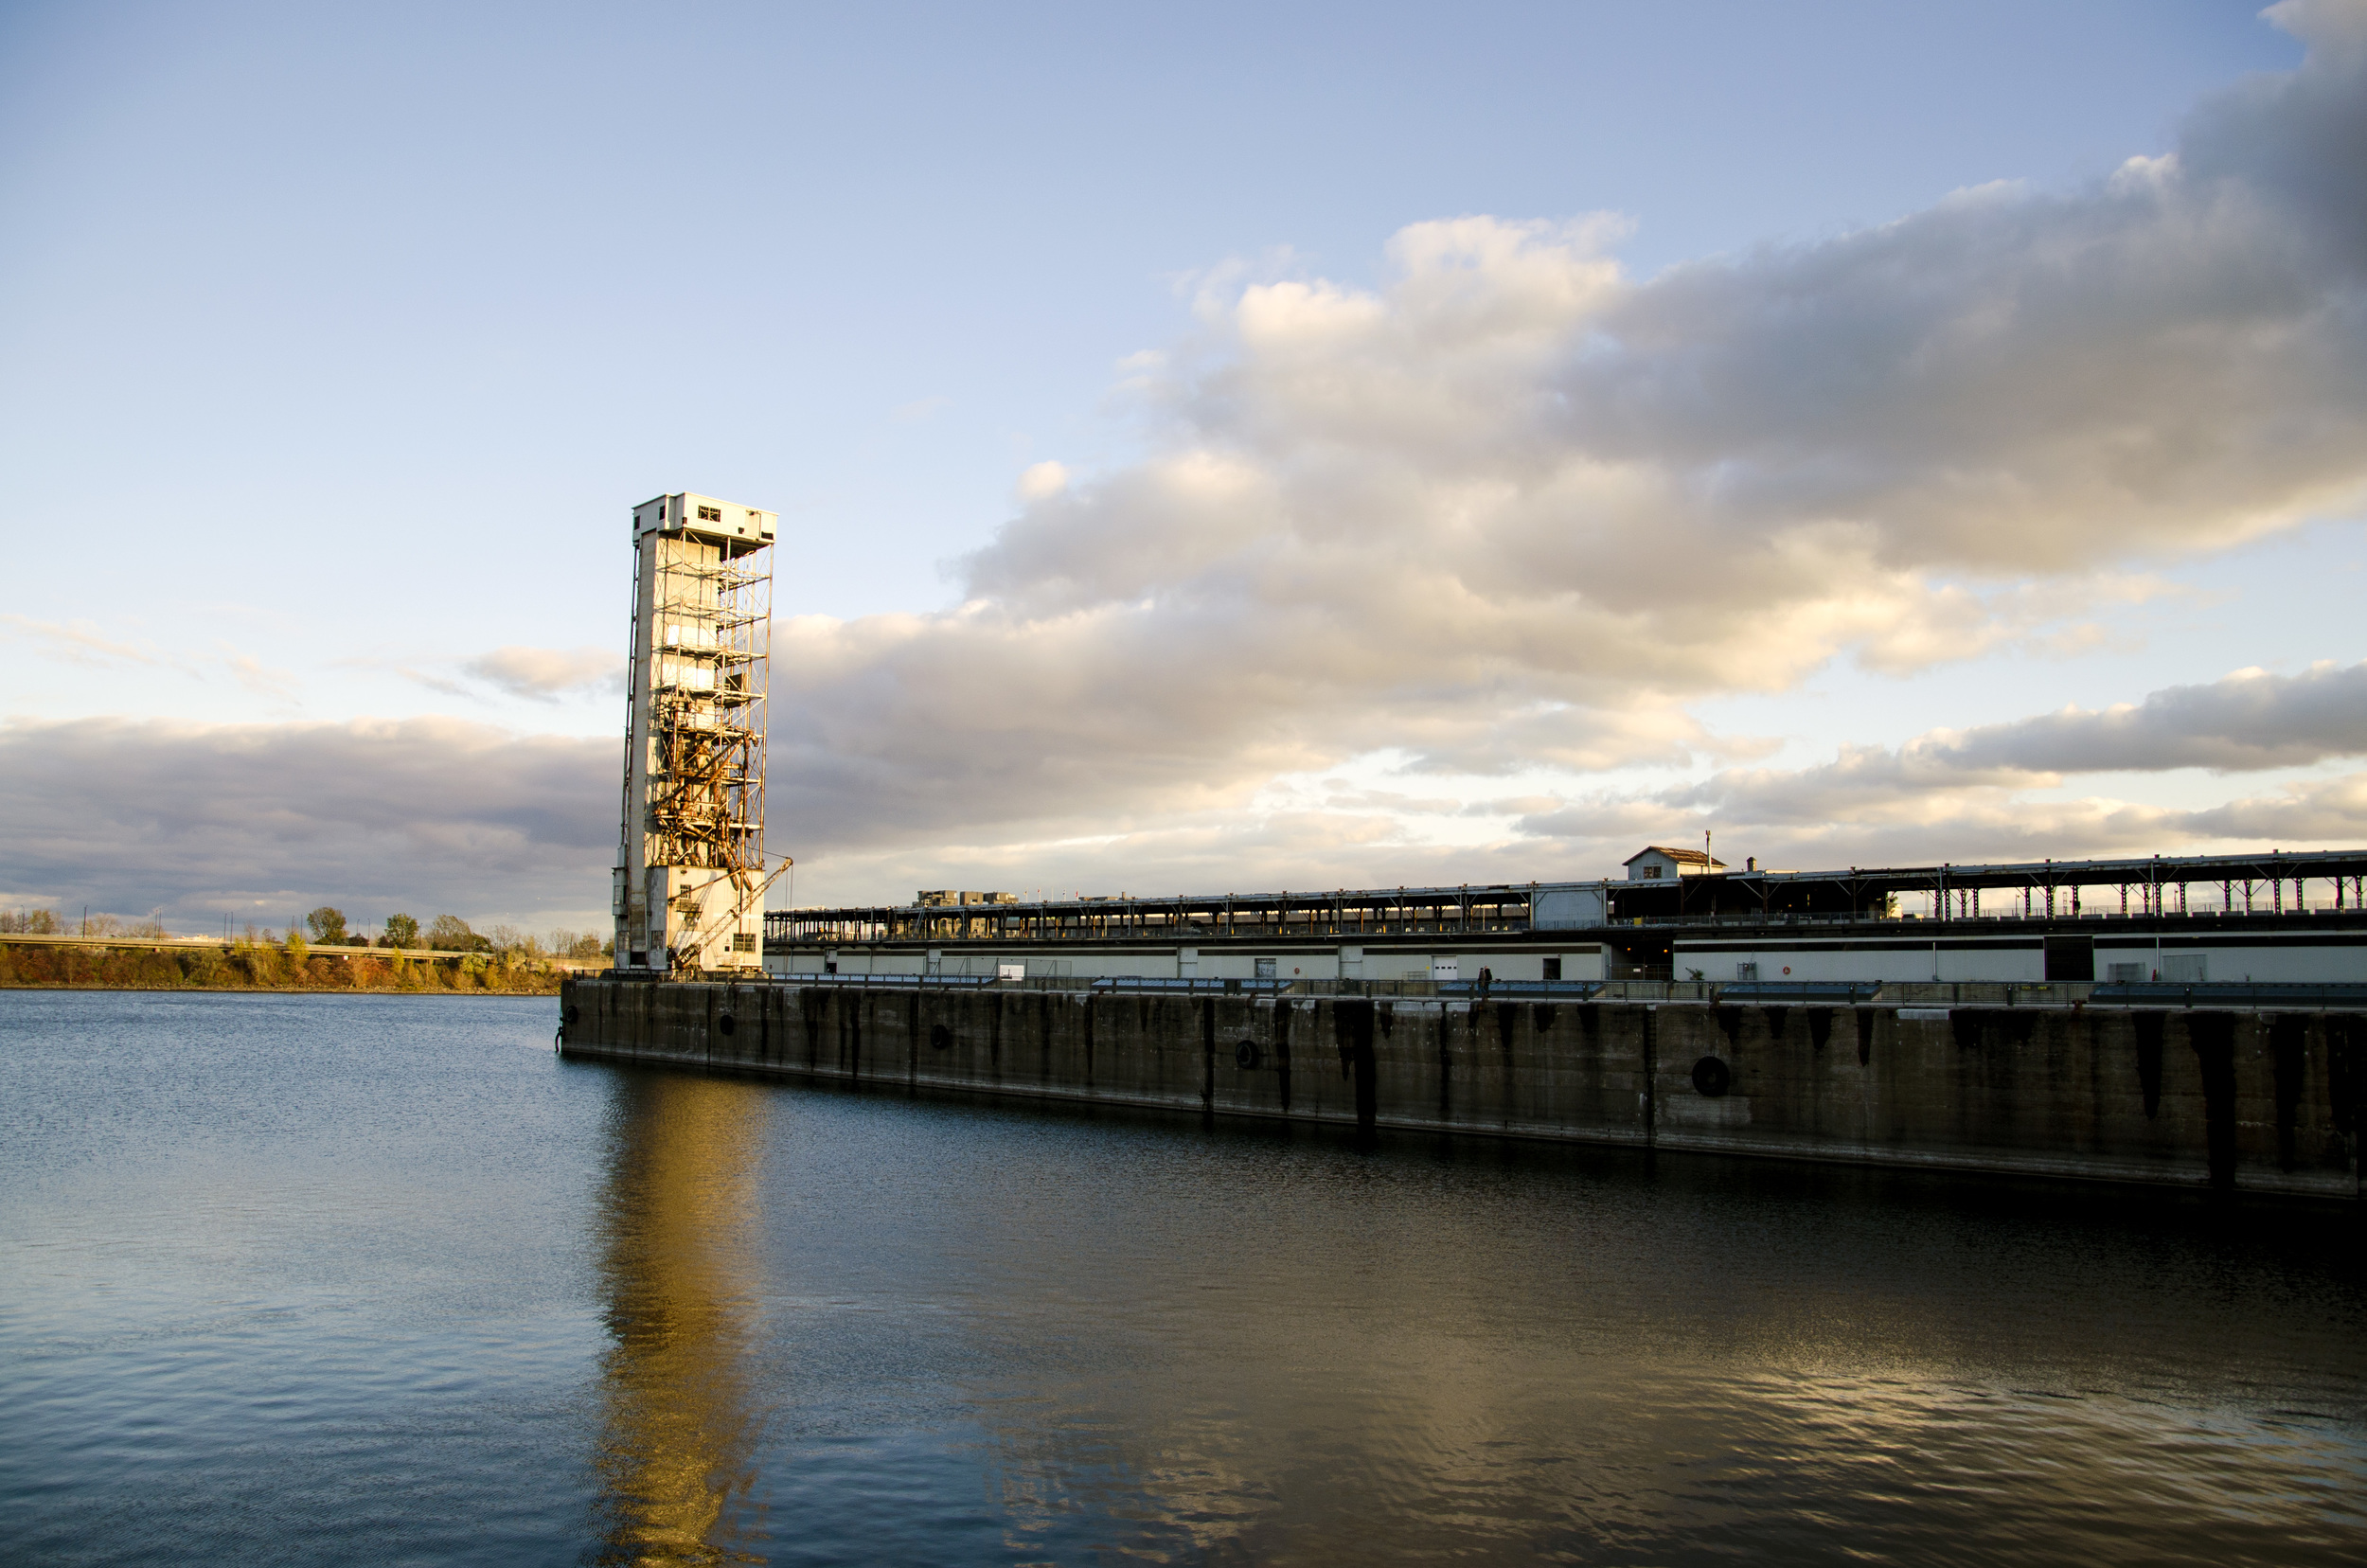 Jenkins, Cheyenne. Old Port . 2014. Digital Photography. Montreal, Quebec